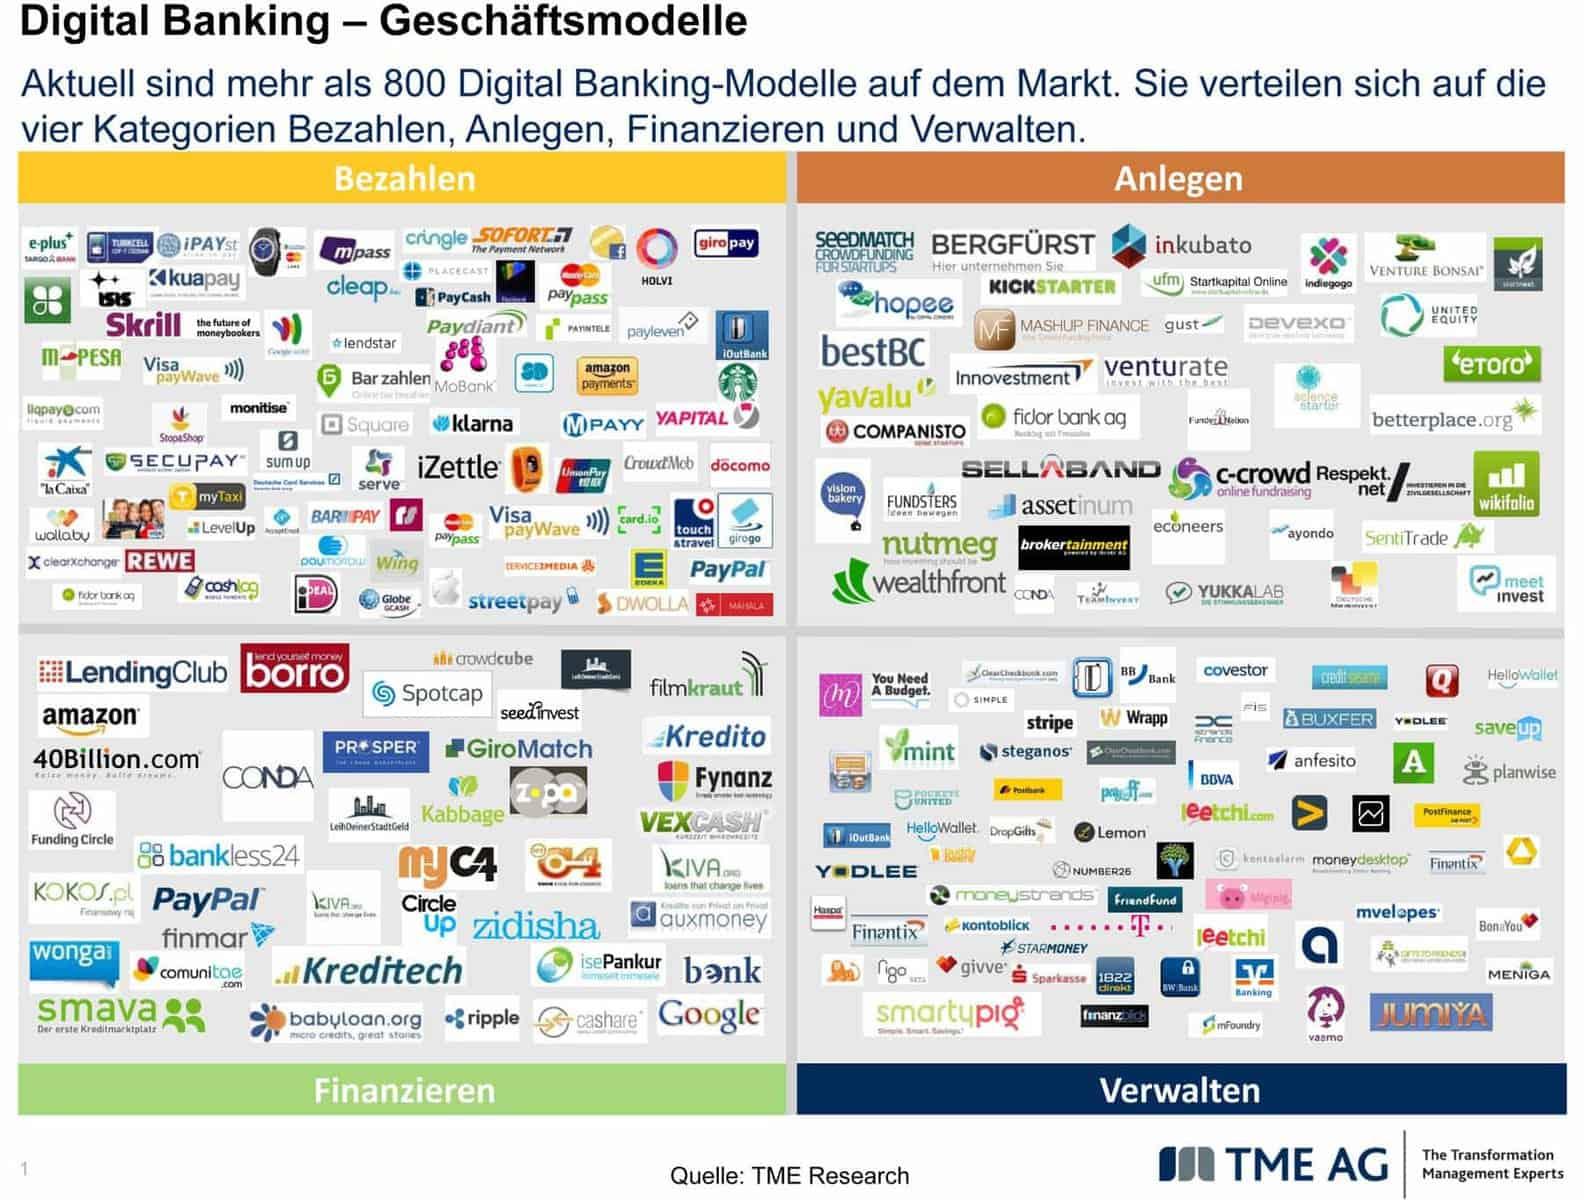 Folie-1_Marktbericht-Digital-Banking-1800